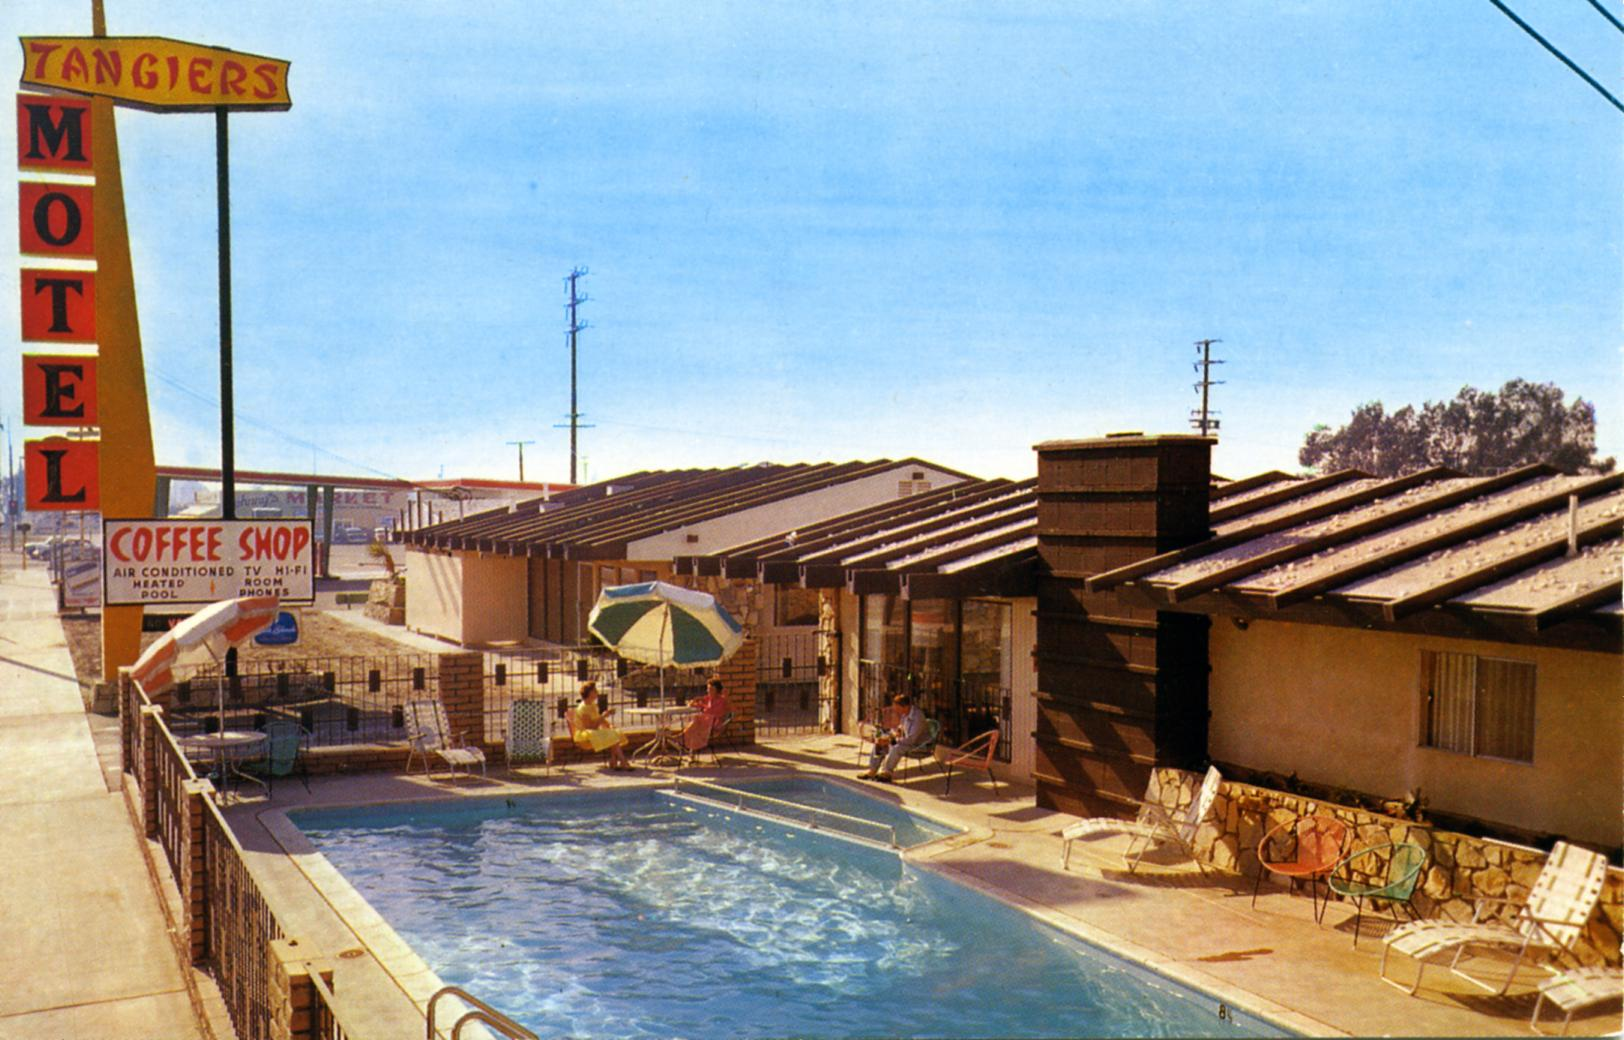 Tangiers Motel - 920 South Beach Boulevard, Anaheim, California U.S.A. - 1960s